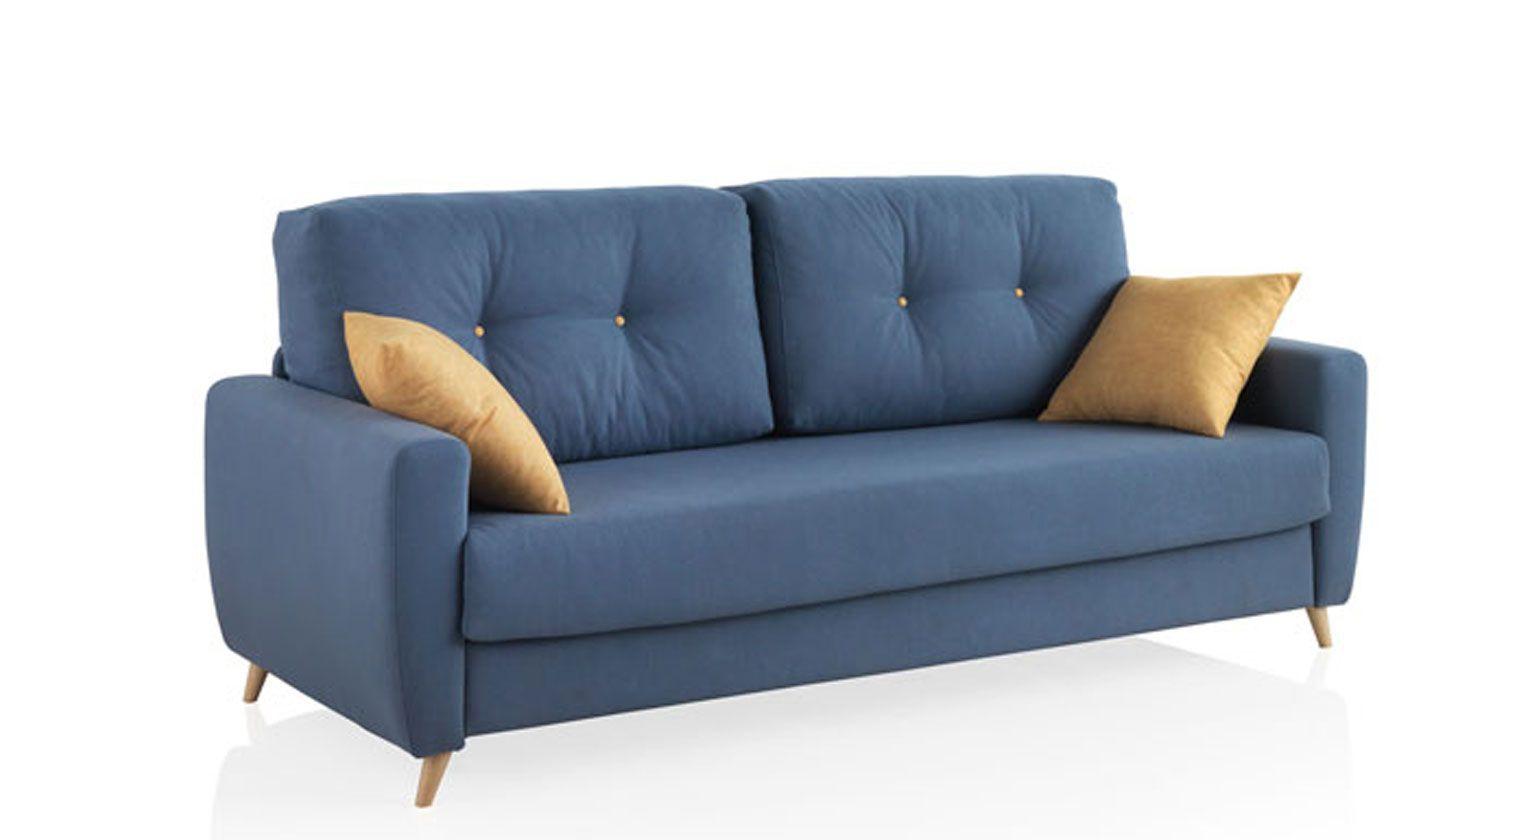 Sofas baratos en cantabria com sofs muebles sofs en for Muebles baratos vigo comprar piso en santander